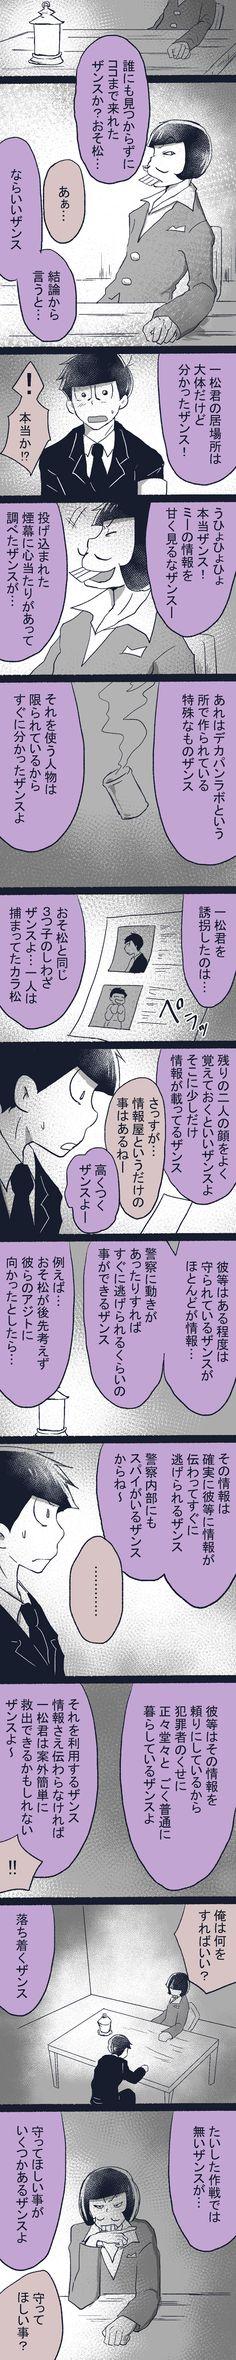 pixiv(ピクシブ)は、作品の投稿・閲覧が楽しめる「イラストコミュニケーションサービス」です。幅広いジャンルの作品が投稿され、ユーザー発の企画やメーカー公認のコンテストが開催されています。 Osomatsu San Doujinshi, Ichimatsu, My Love, Anime, Cartoon Movies, Anime Music, Animation, Anime Shows